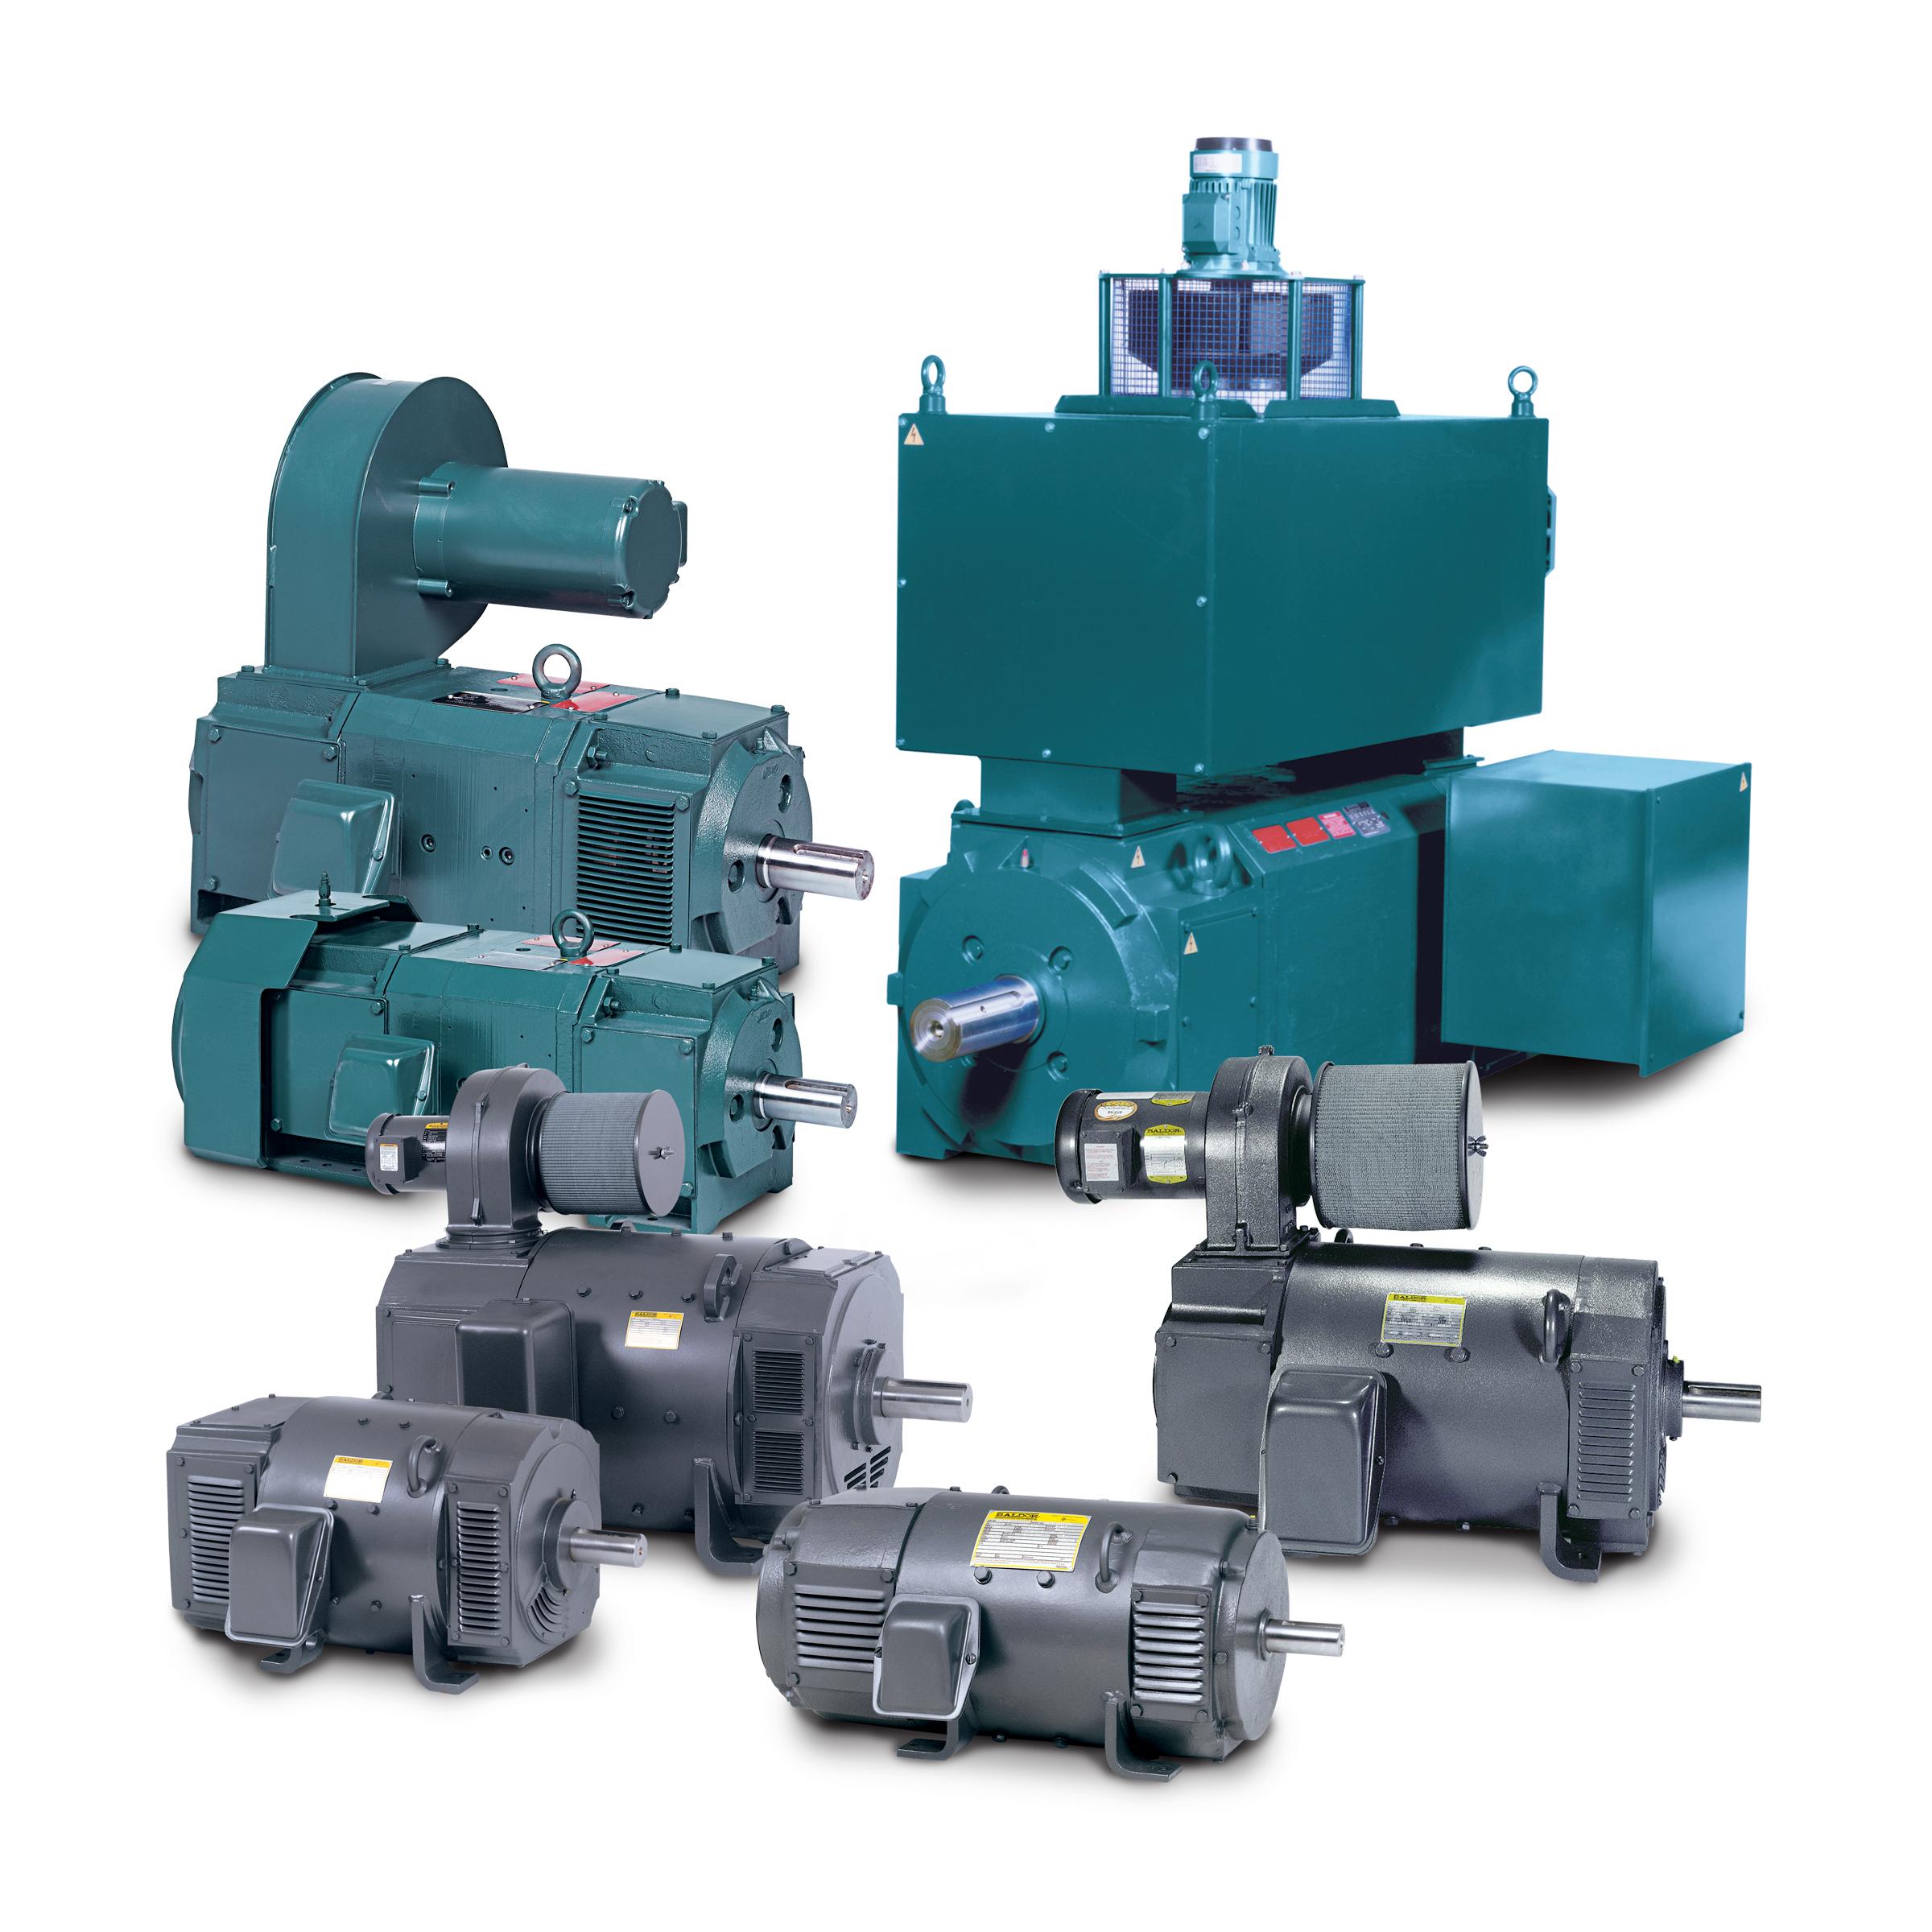 baldor reliance dc motor family all.ashx?bc=white&as=1&w=1024 dc motors baldor com baldor dc motor wiring diagram at gsmx.co